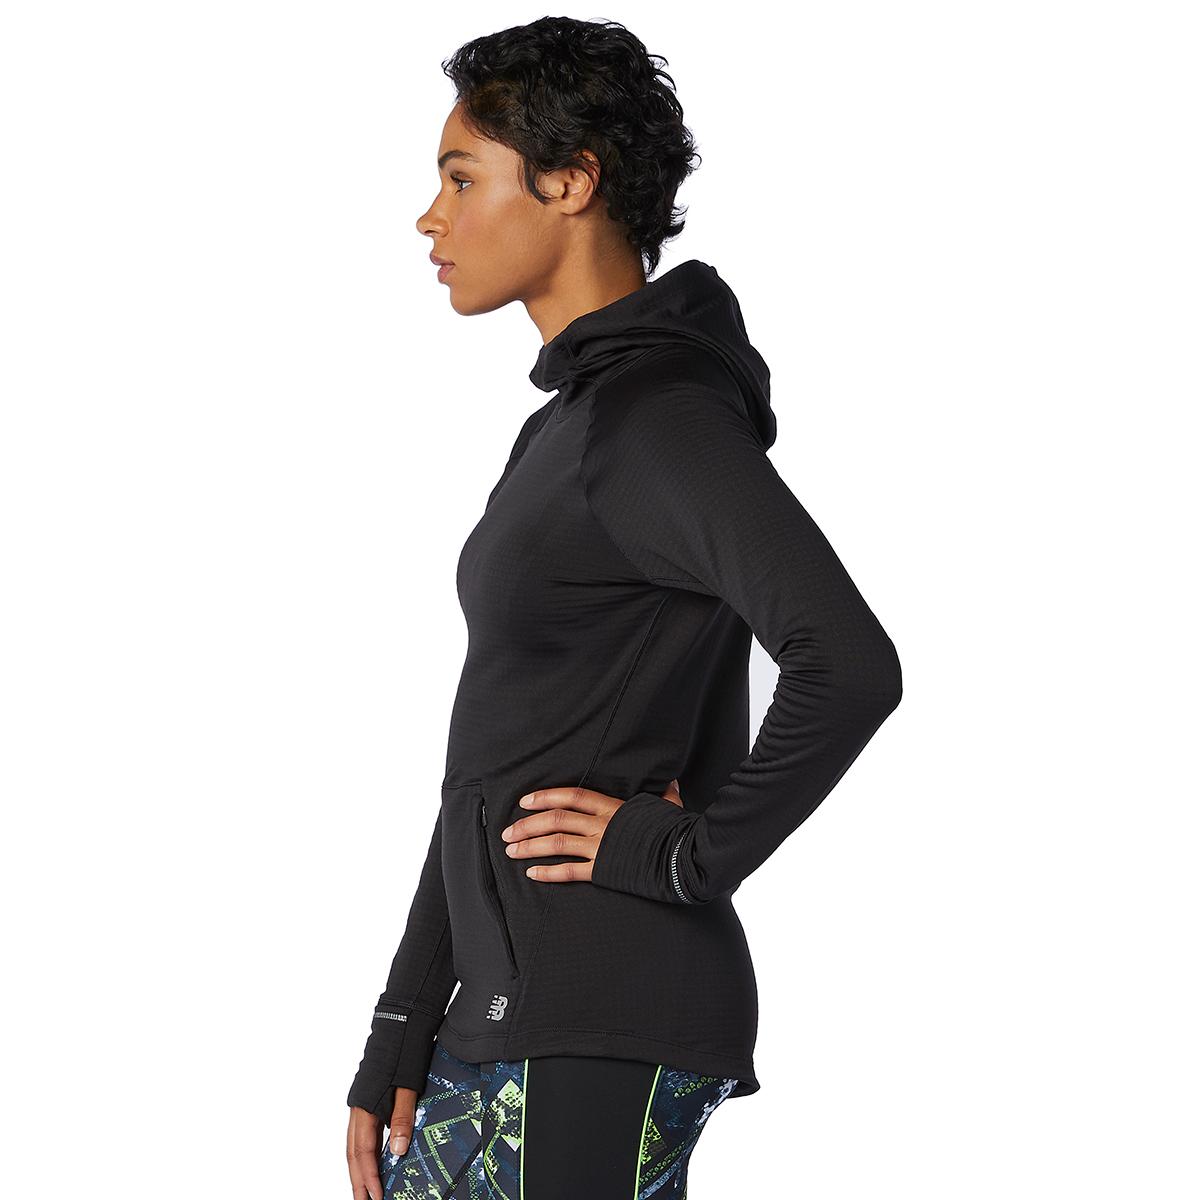 Women's New Balance Heat Grid Hoodie, , large, image 2